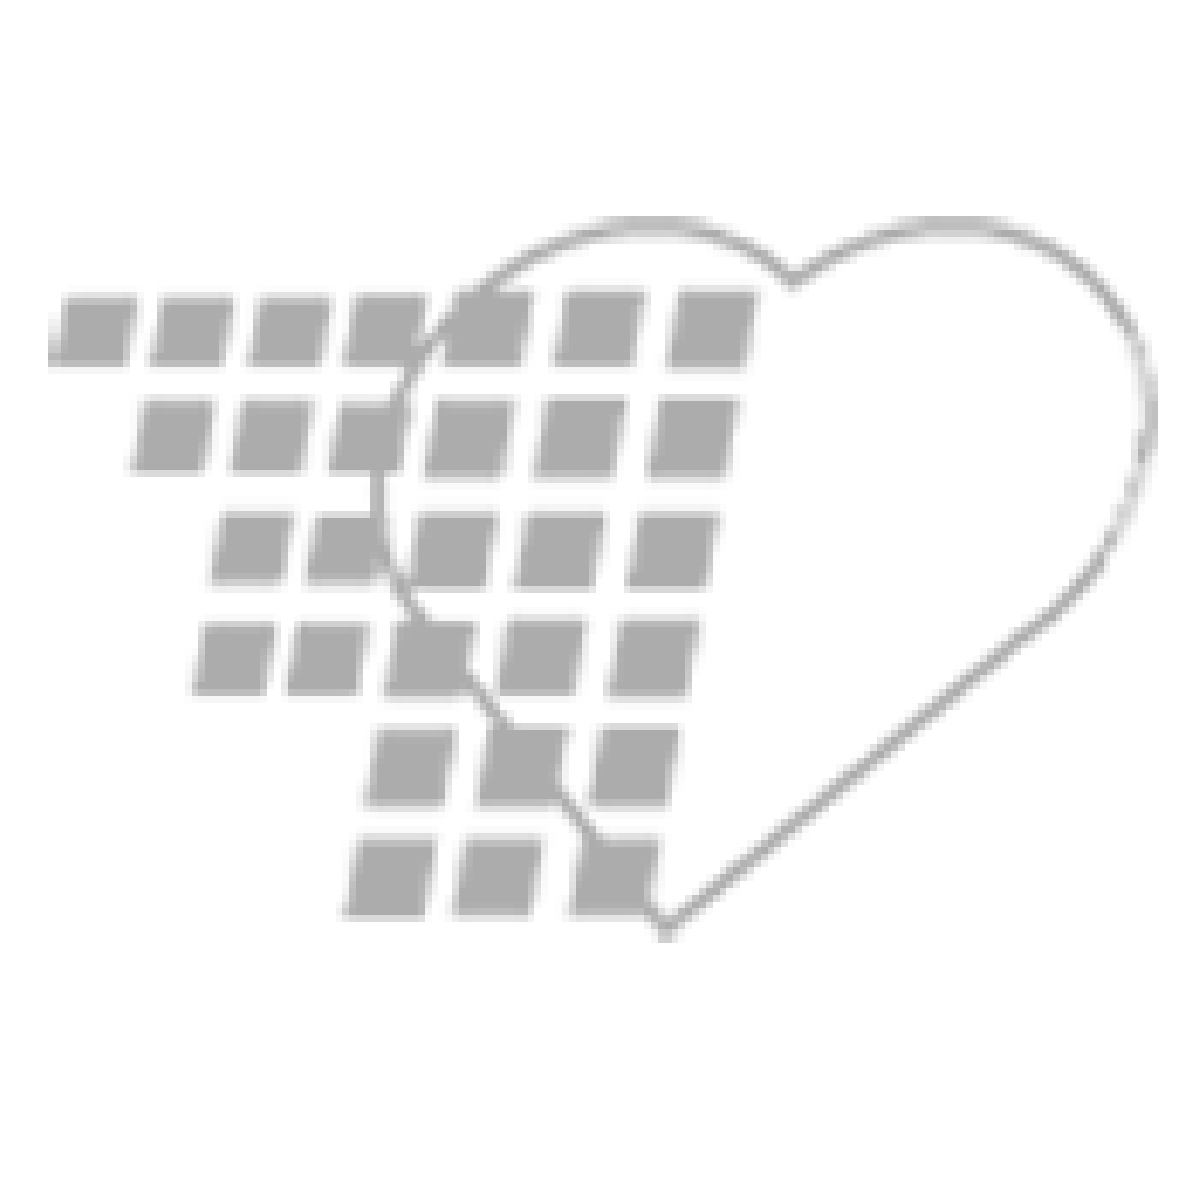 06-93-0075 - Demo Dose® Fexofenadin 160 mg - 1000 Pills/Jar